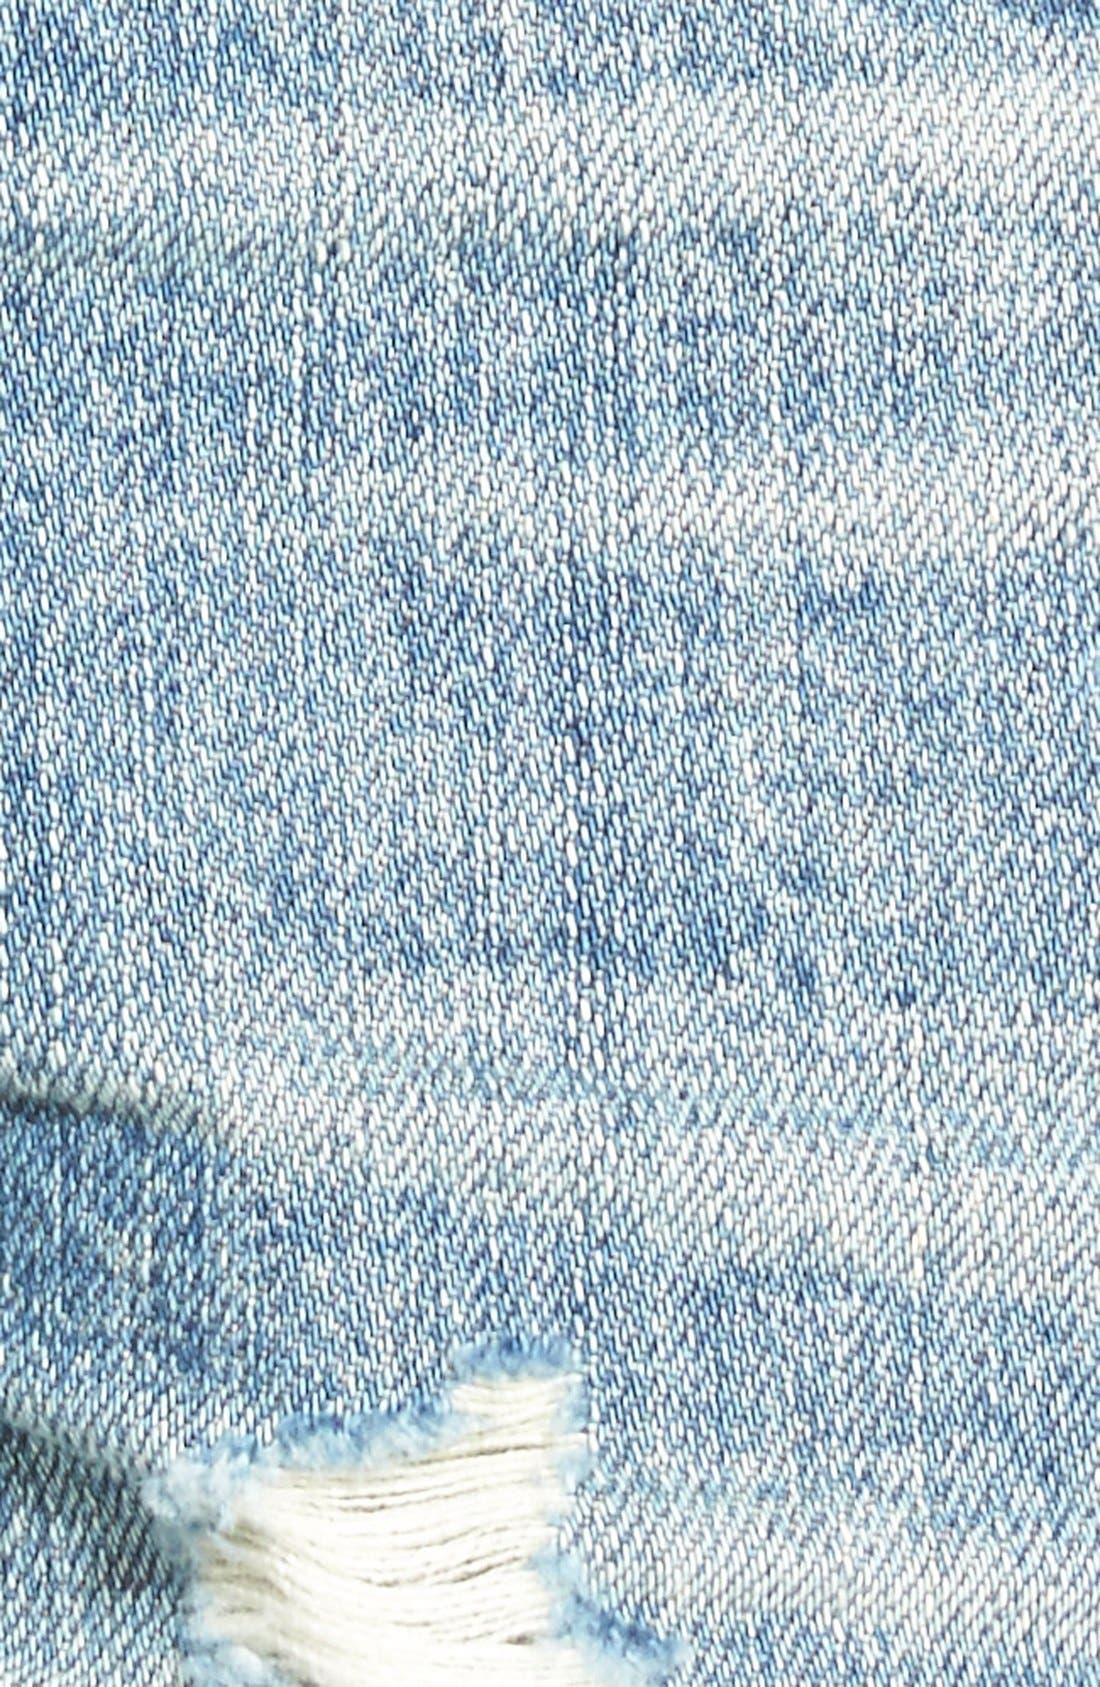 Cuffed Distressed Denim Shorts,                             Alternate thumbnail 4, color,                             400